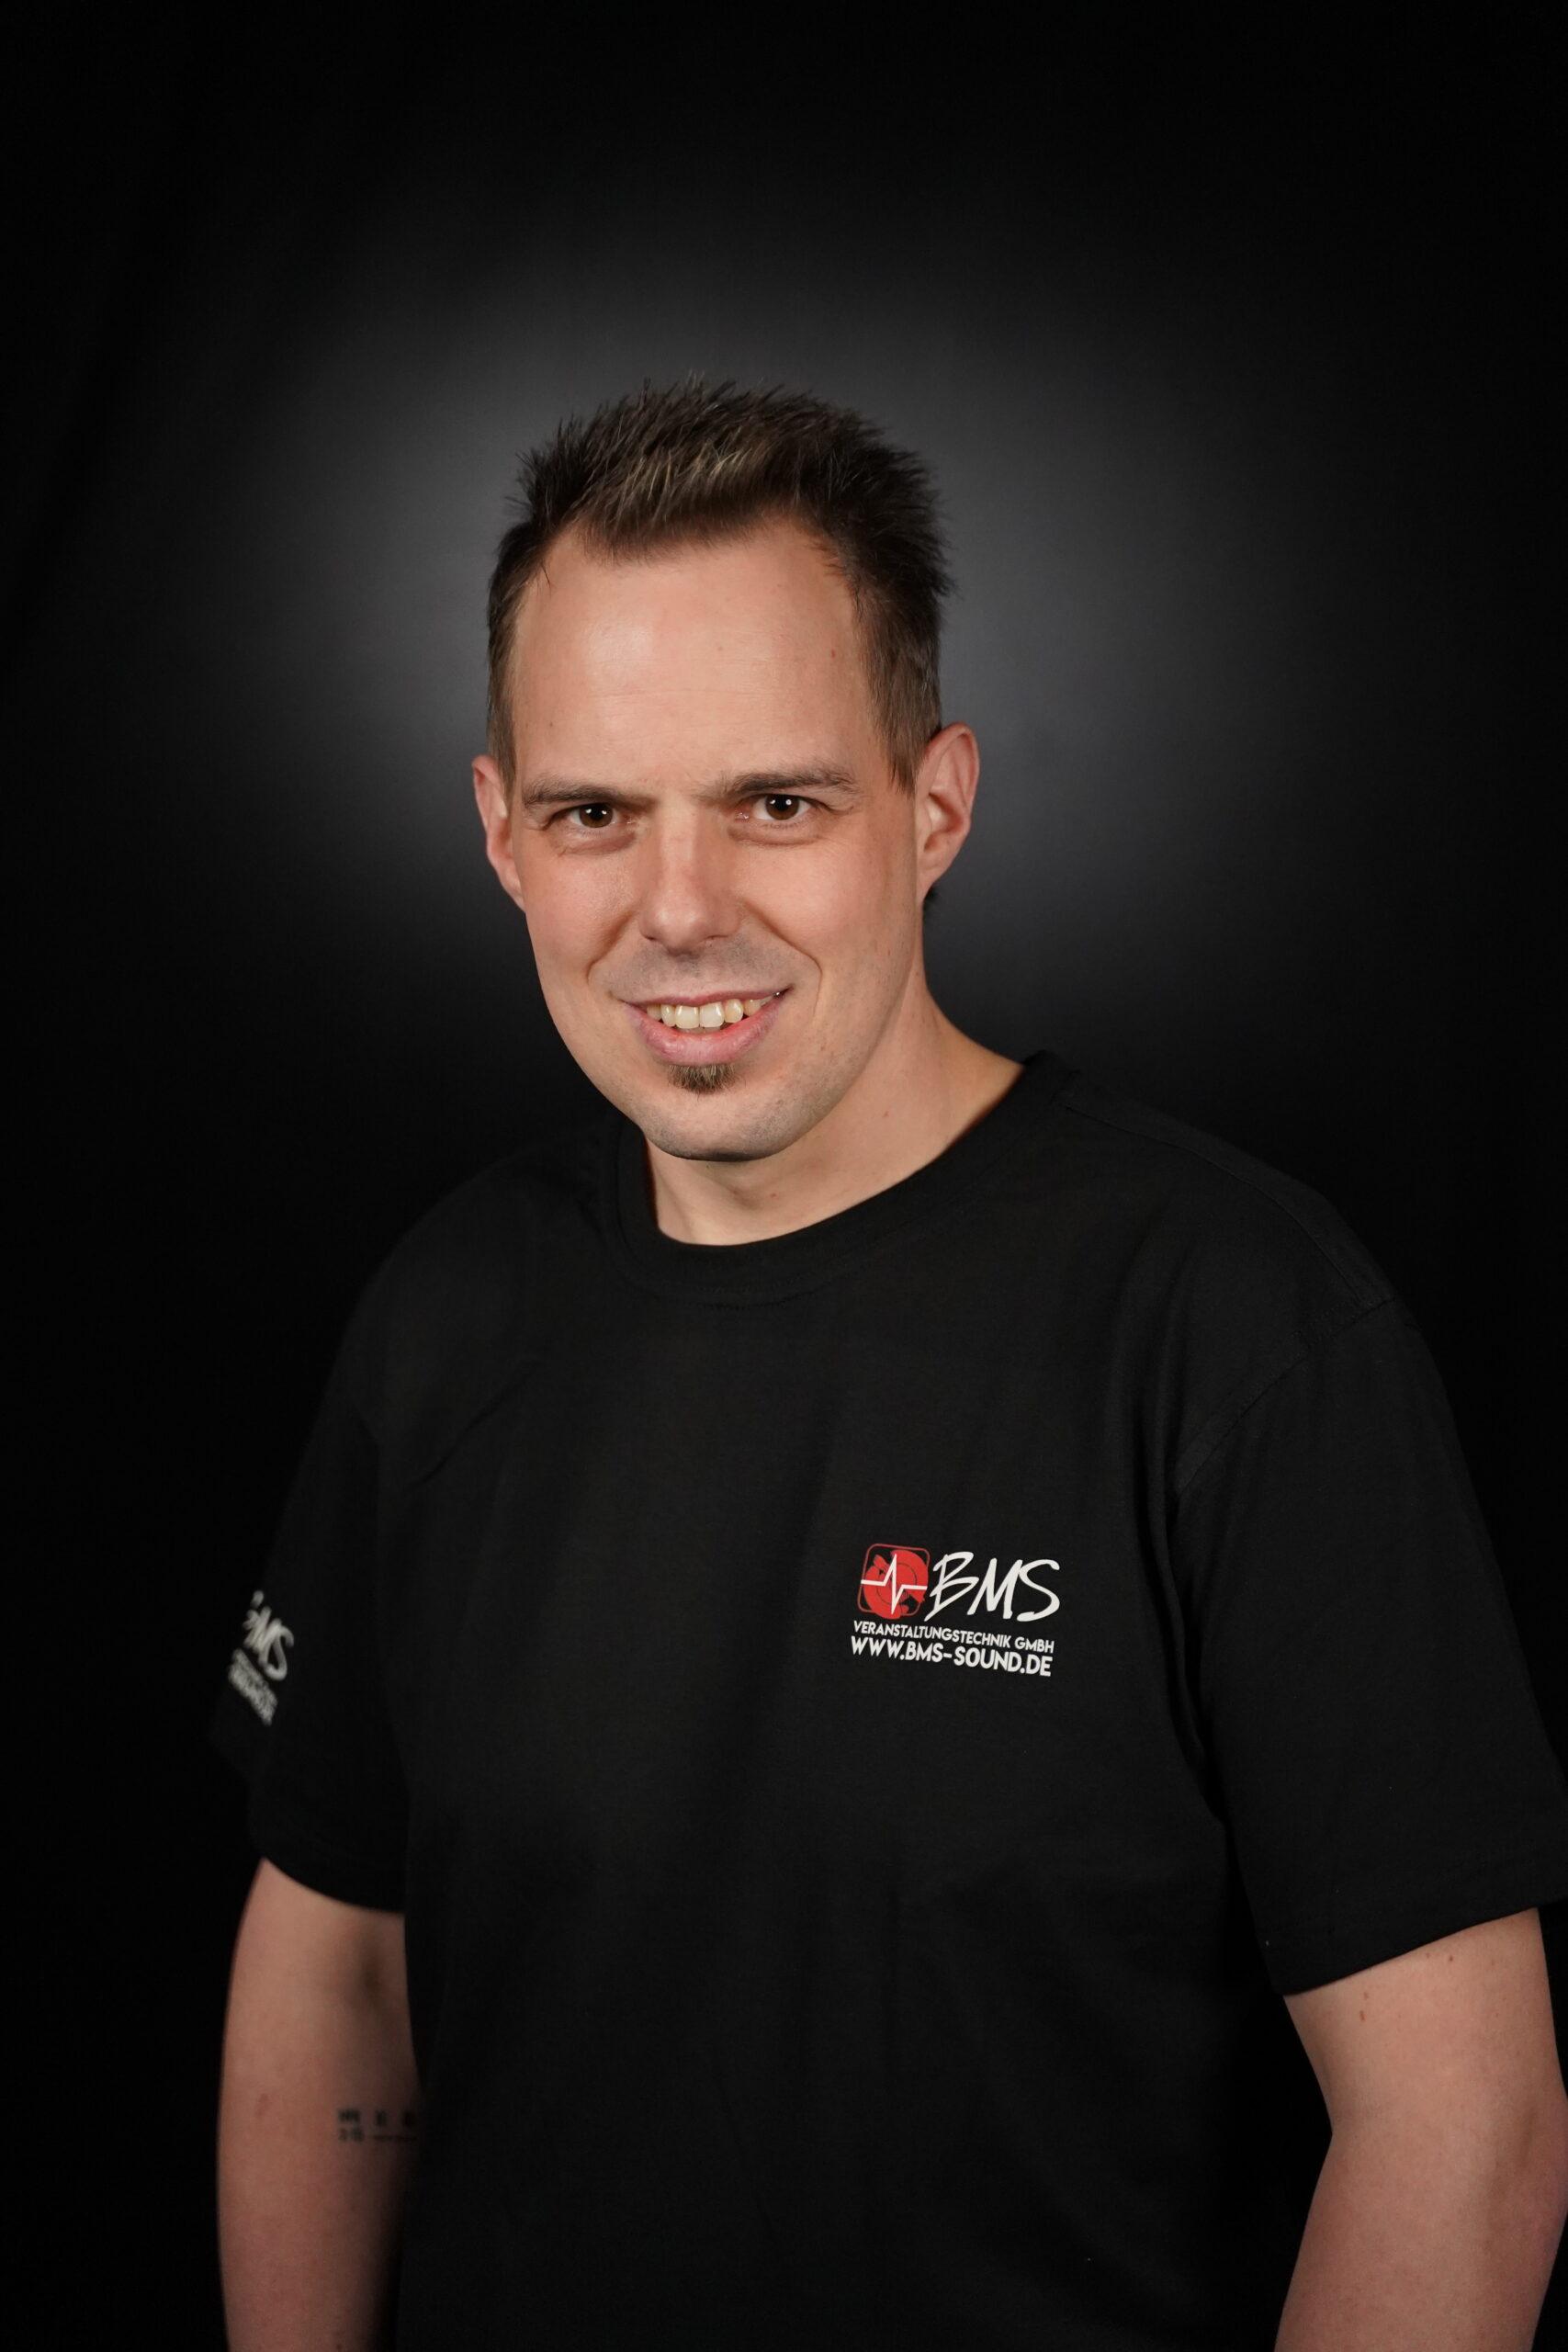 Patrick Büchmüller BMS Veranstaltungstechnik GmbH